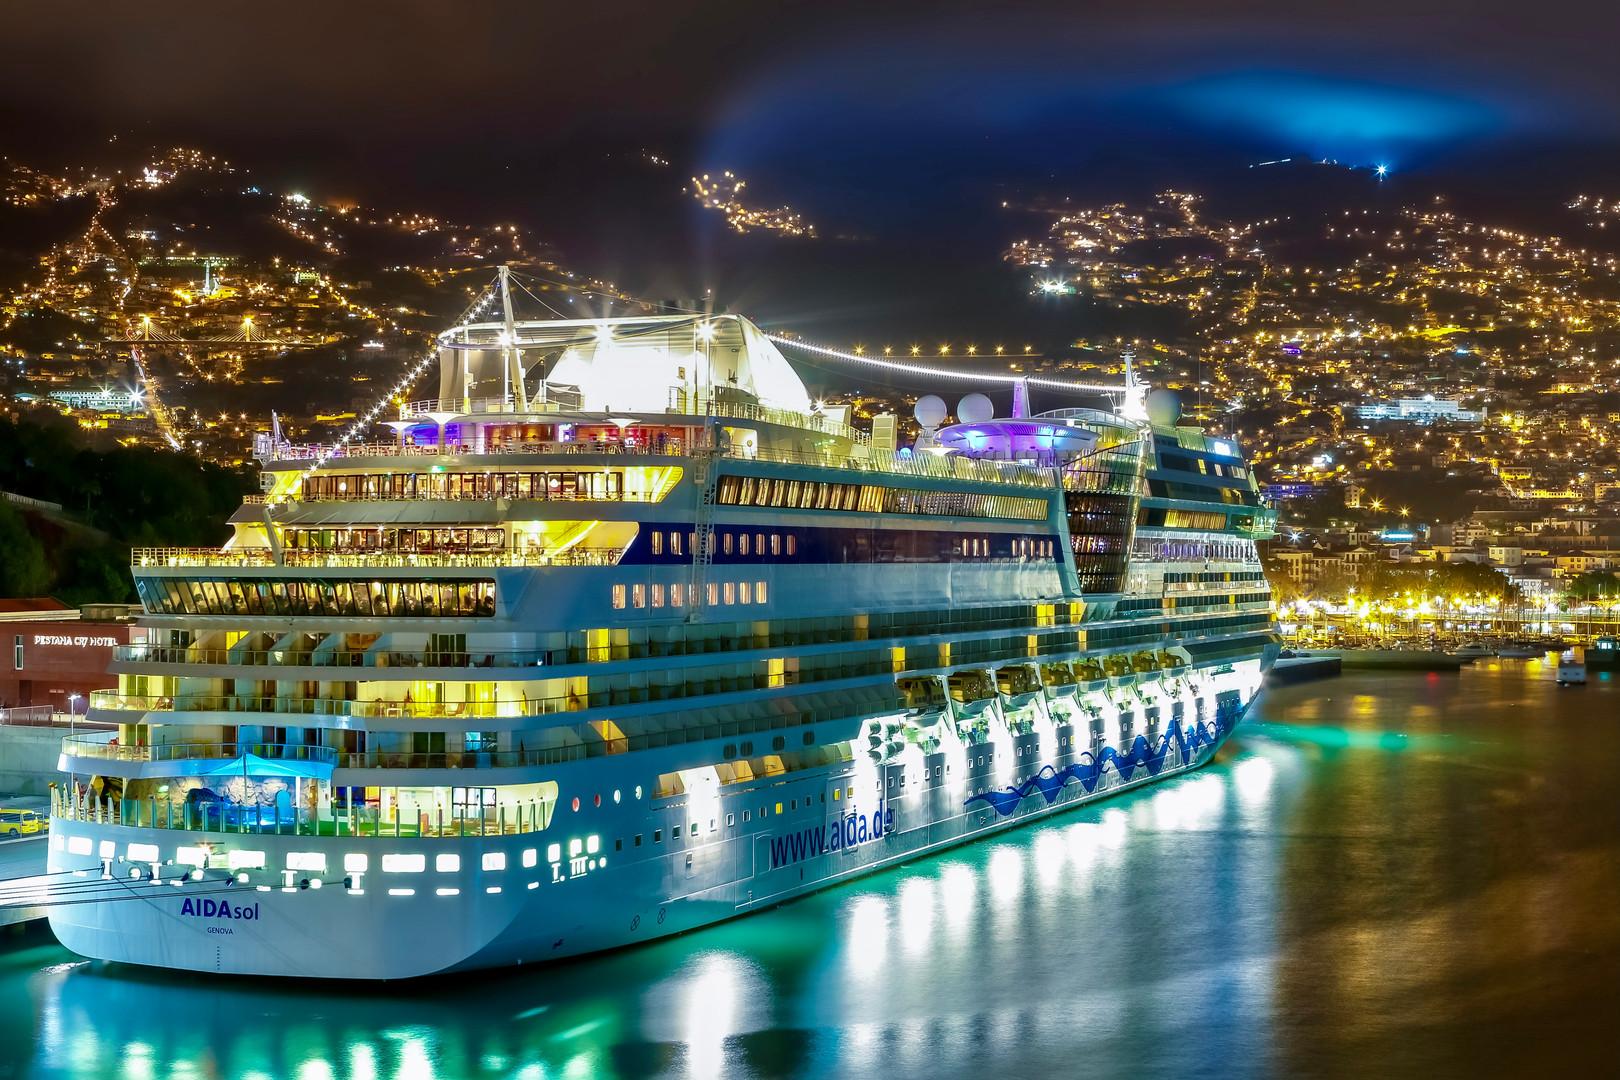 AidaSol - Genova 00:00am Port Of Funchal